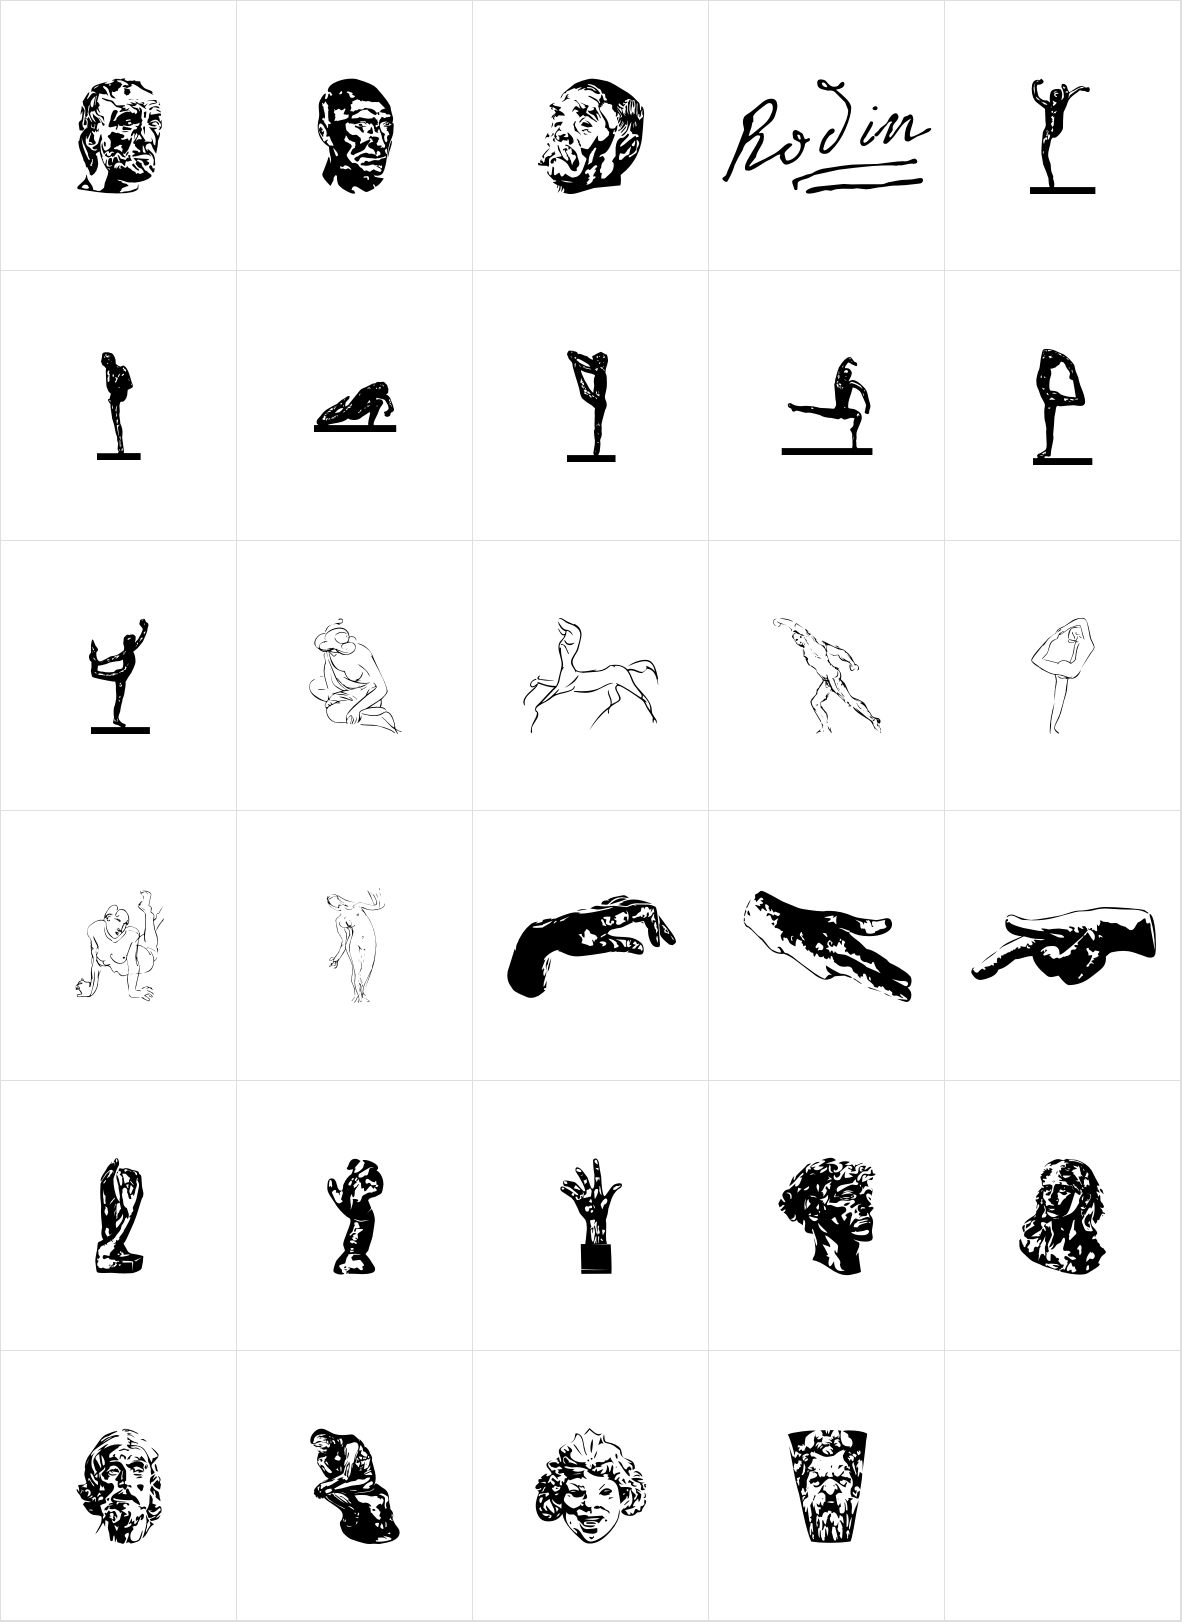 P22 Rodin Extras